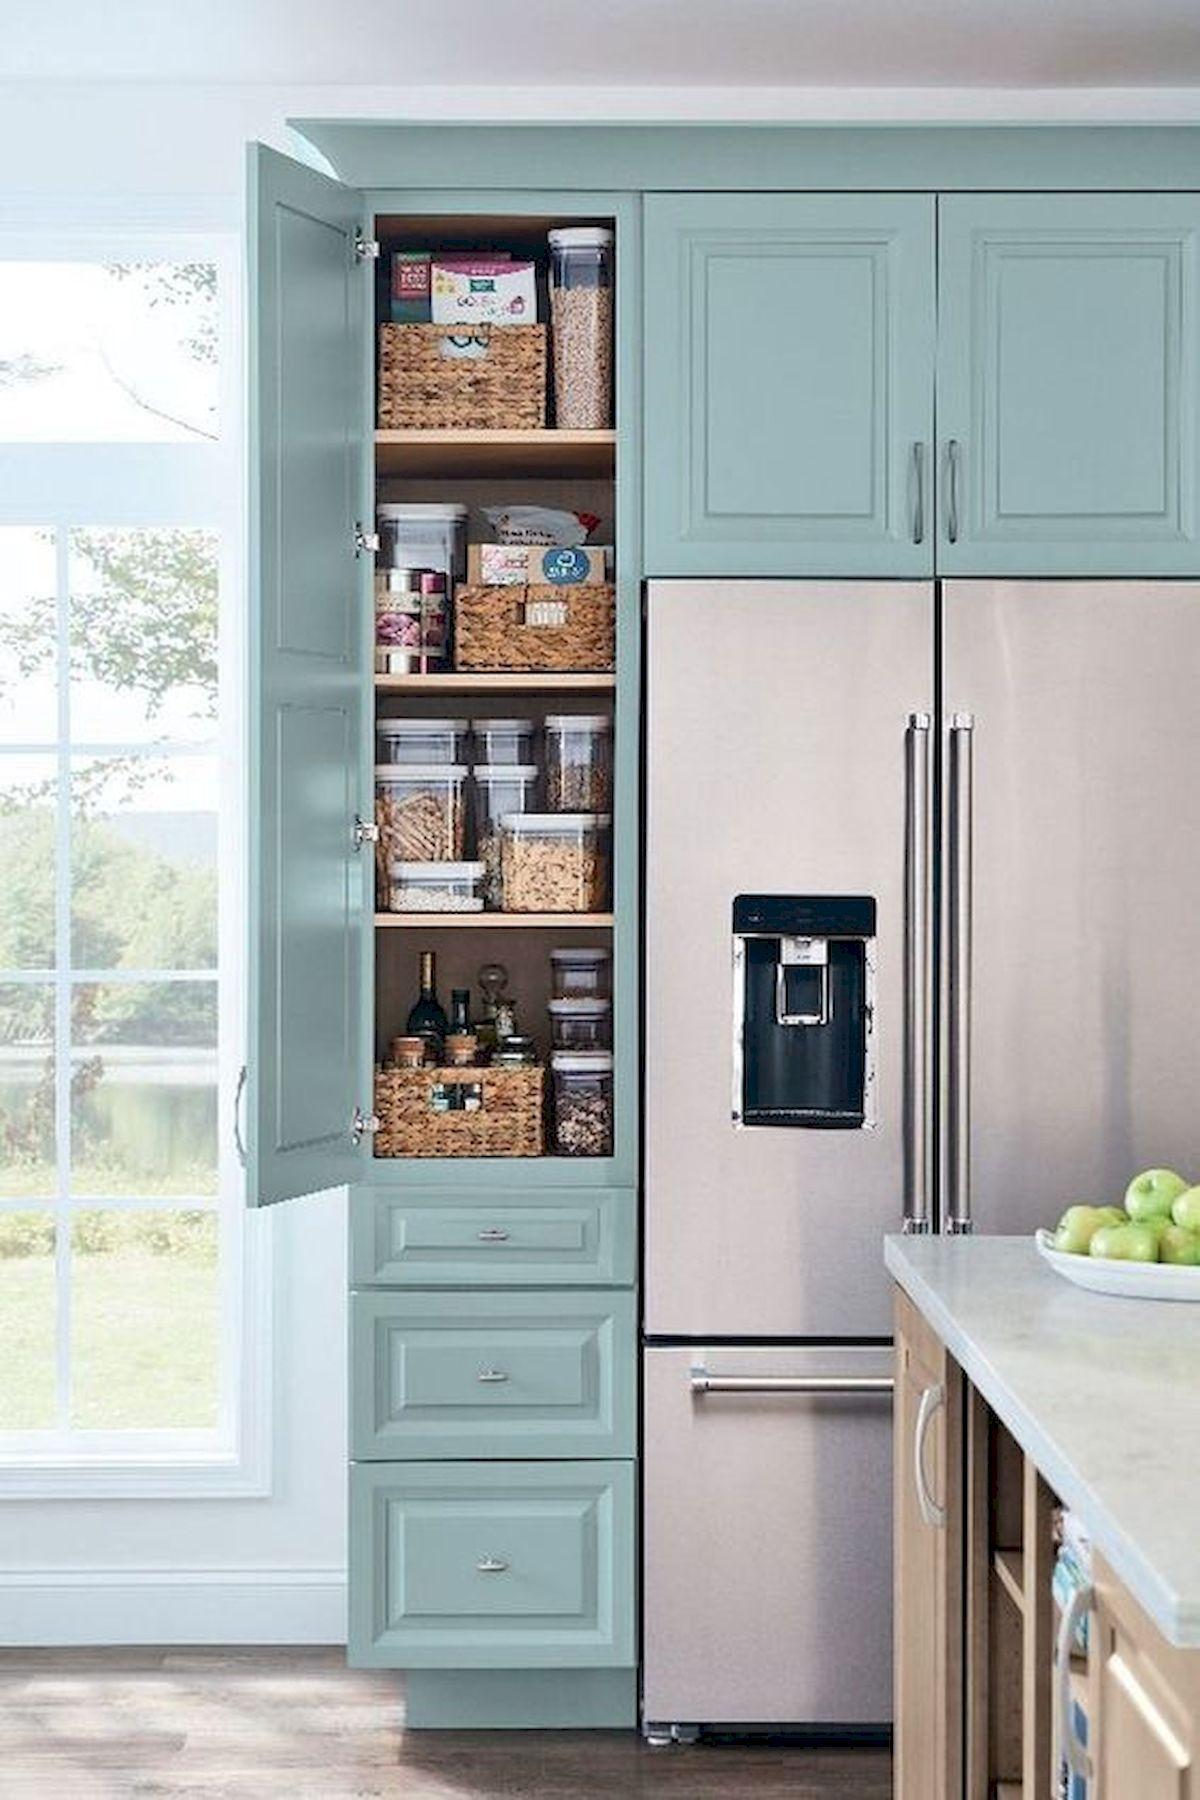 30 Awesome DIY Kitchen Cabinets Ideas #kitchenpantrycabinets